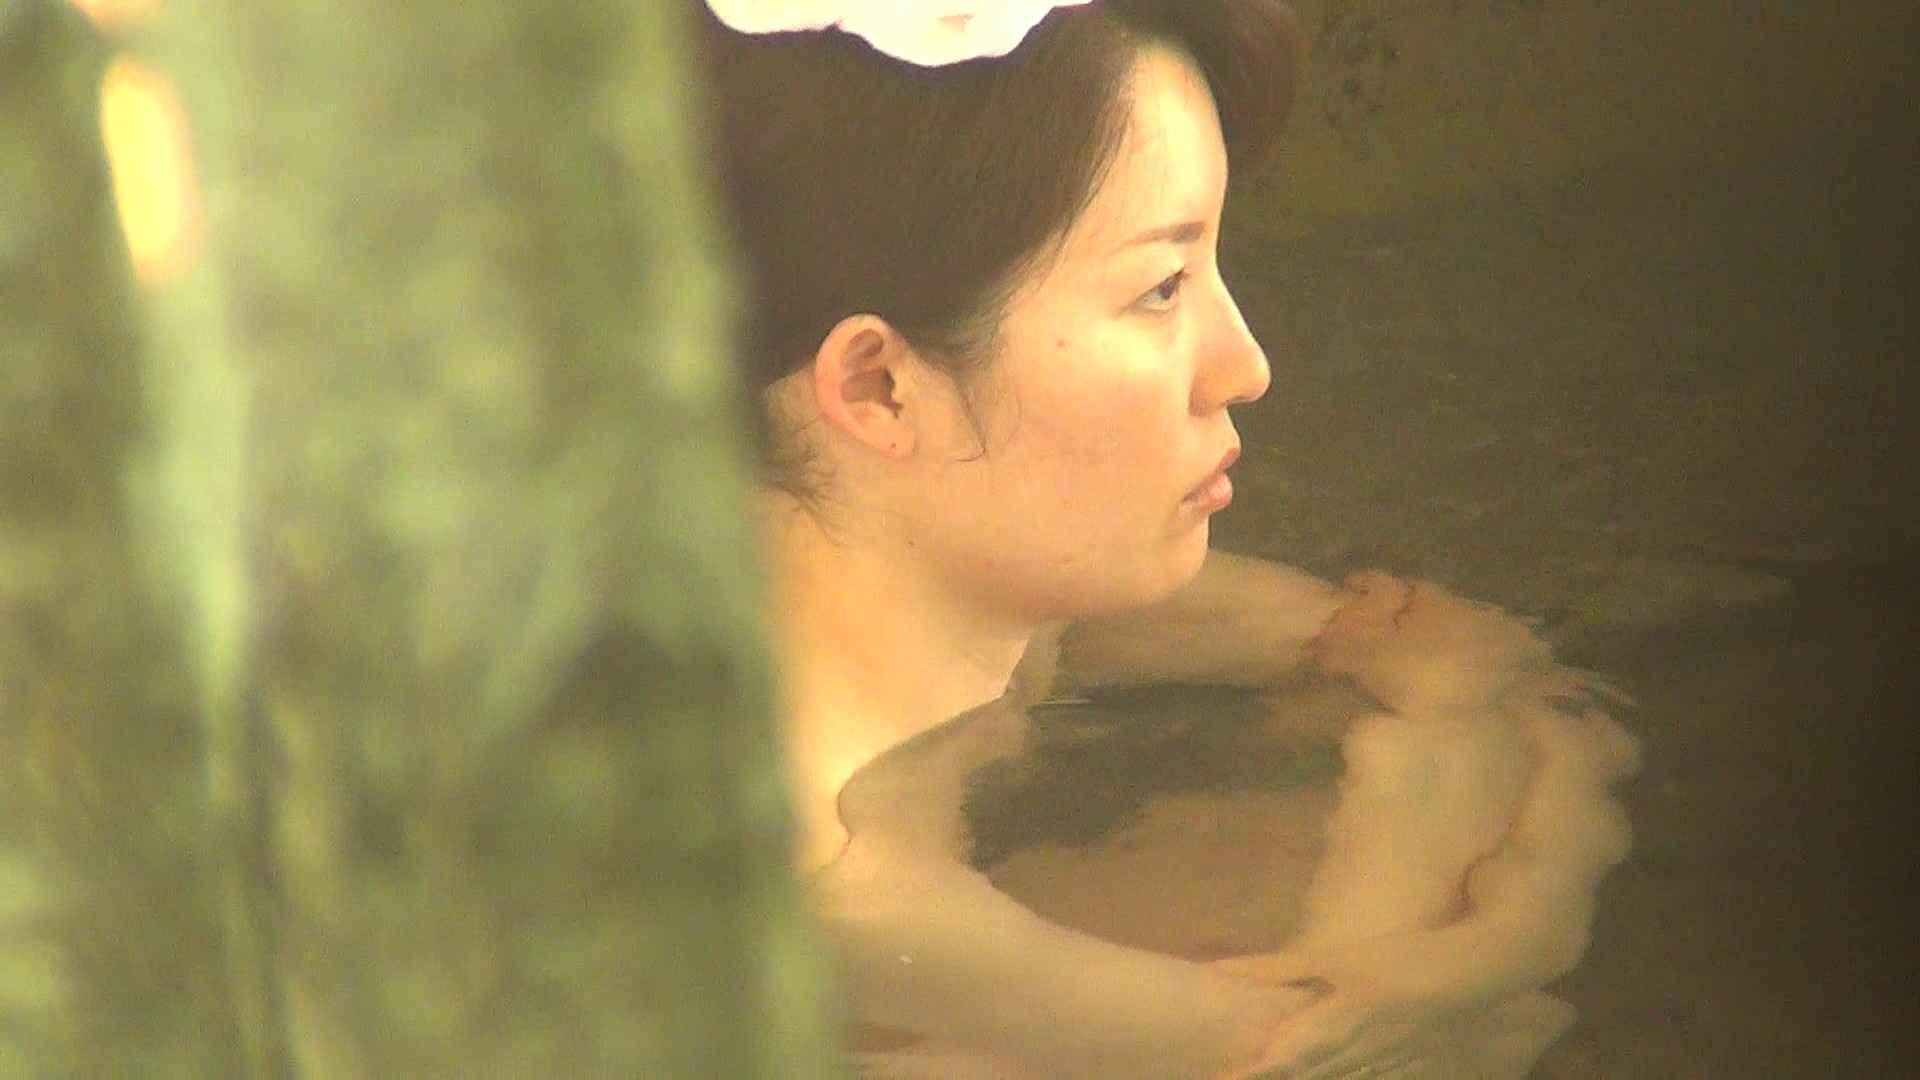 Aquaな露天風呂Vol.301 OLのエロ生活 すけべAV動画紹介 112連発 104